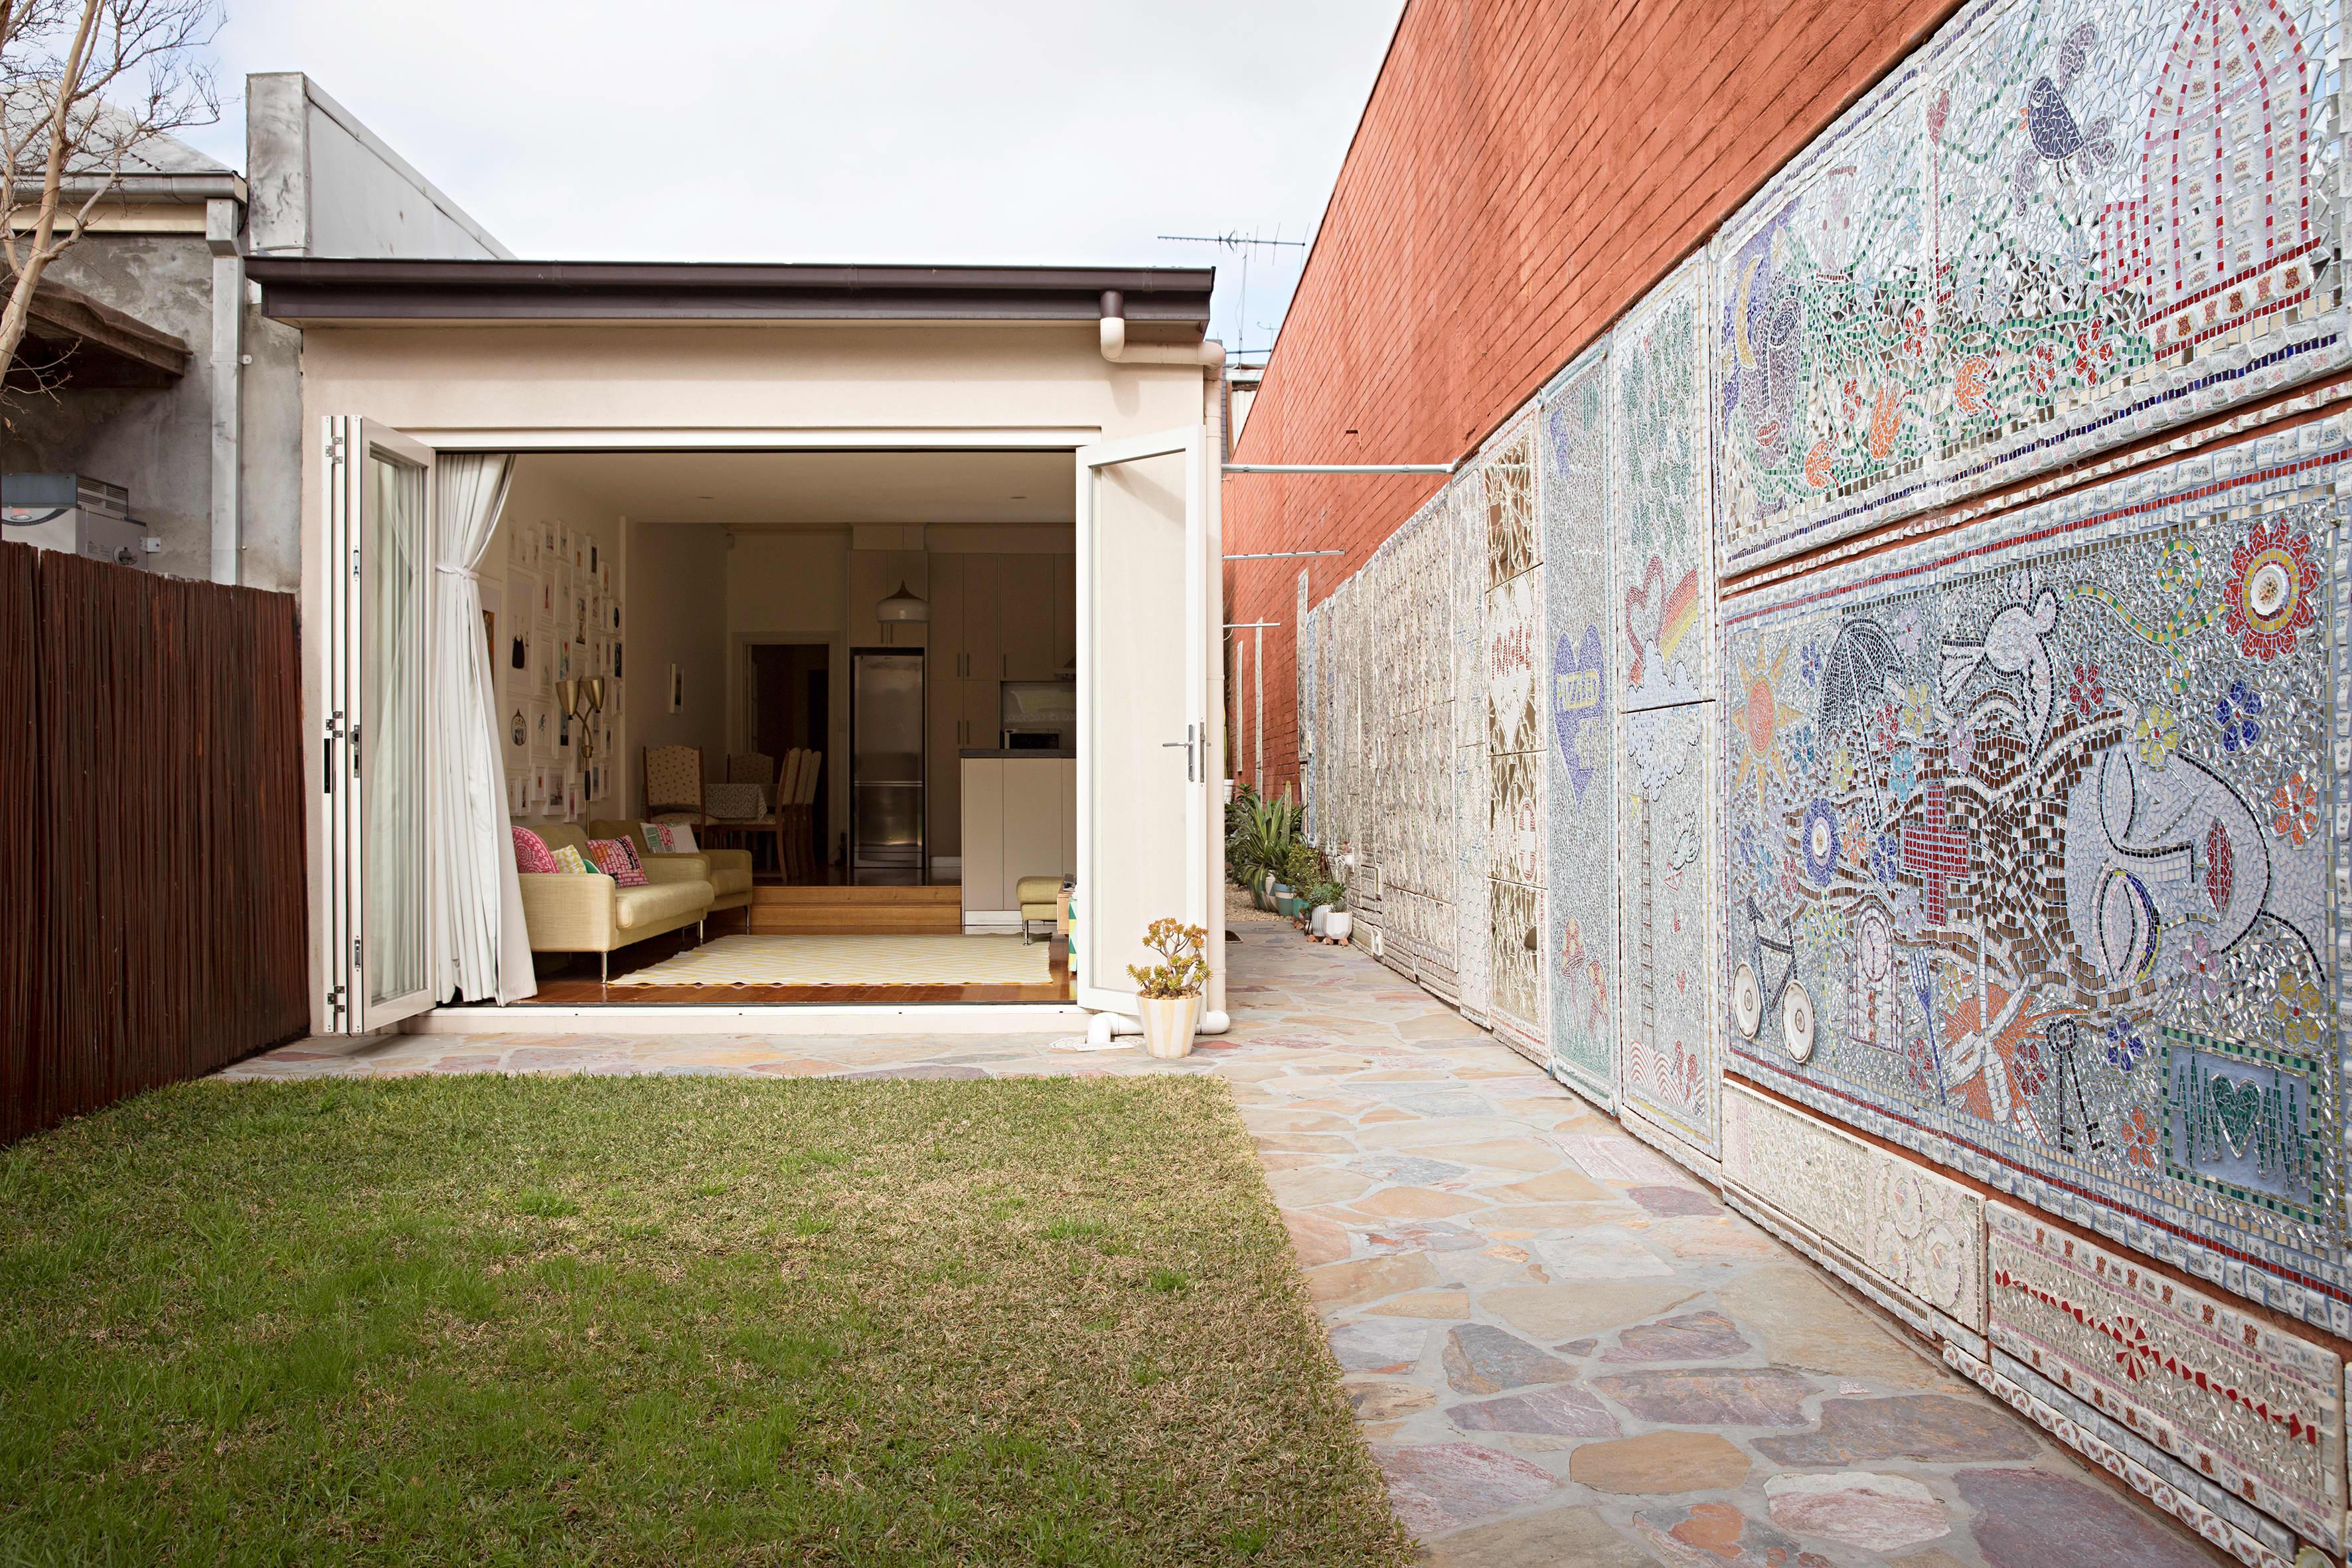 House Tour: A Mosaic Artist's Minimal & Modern Cottage